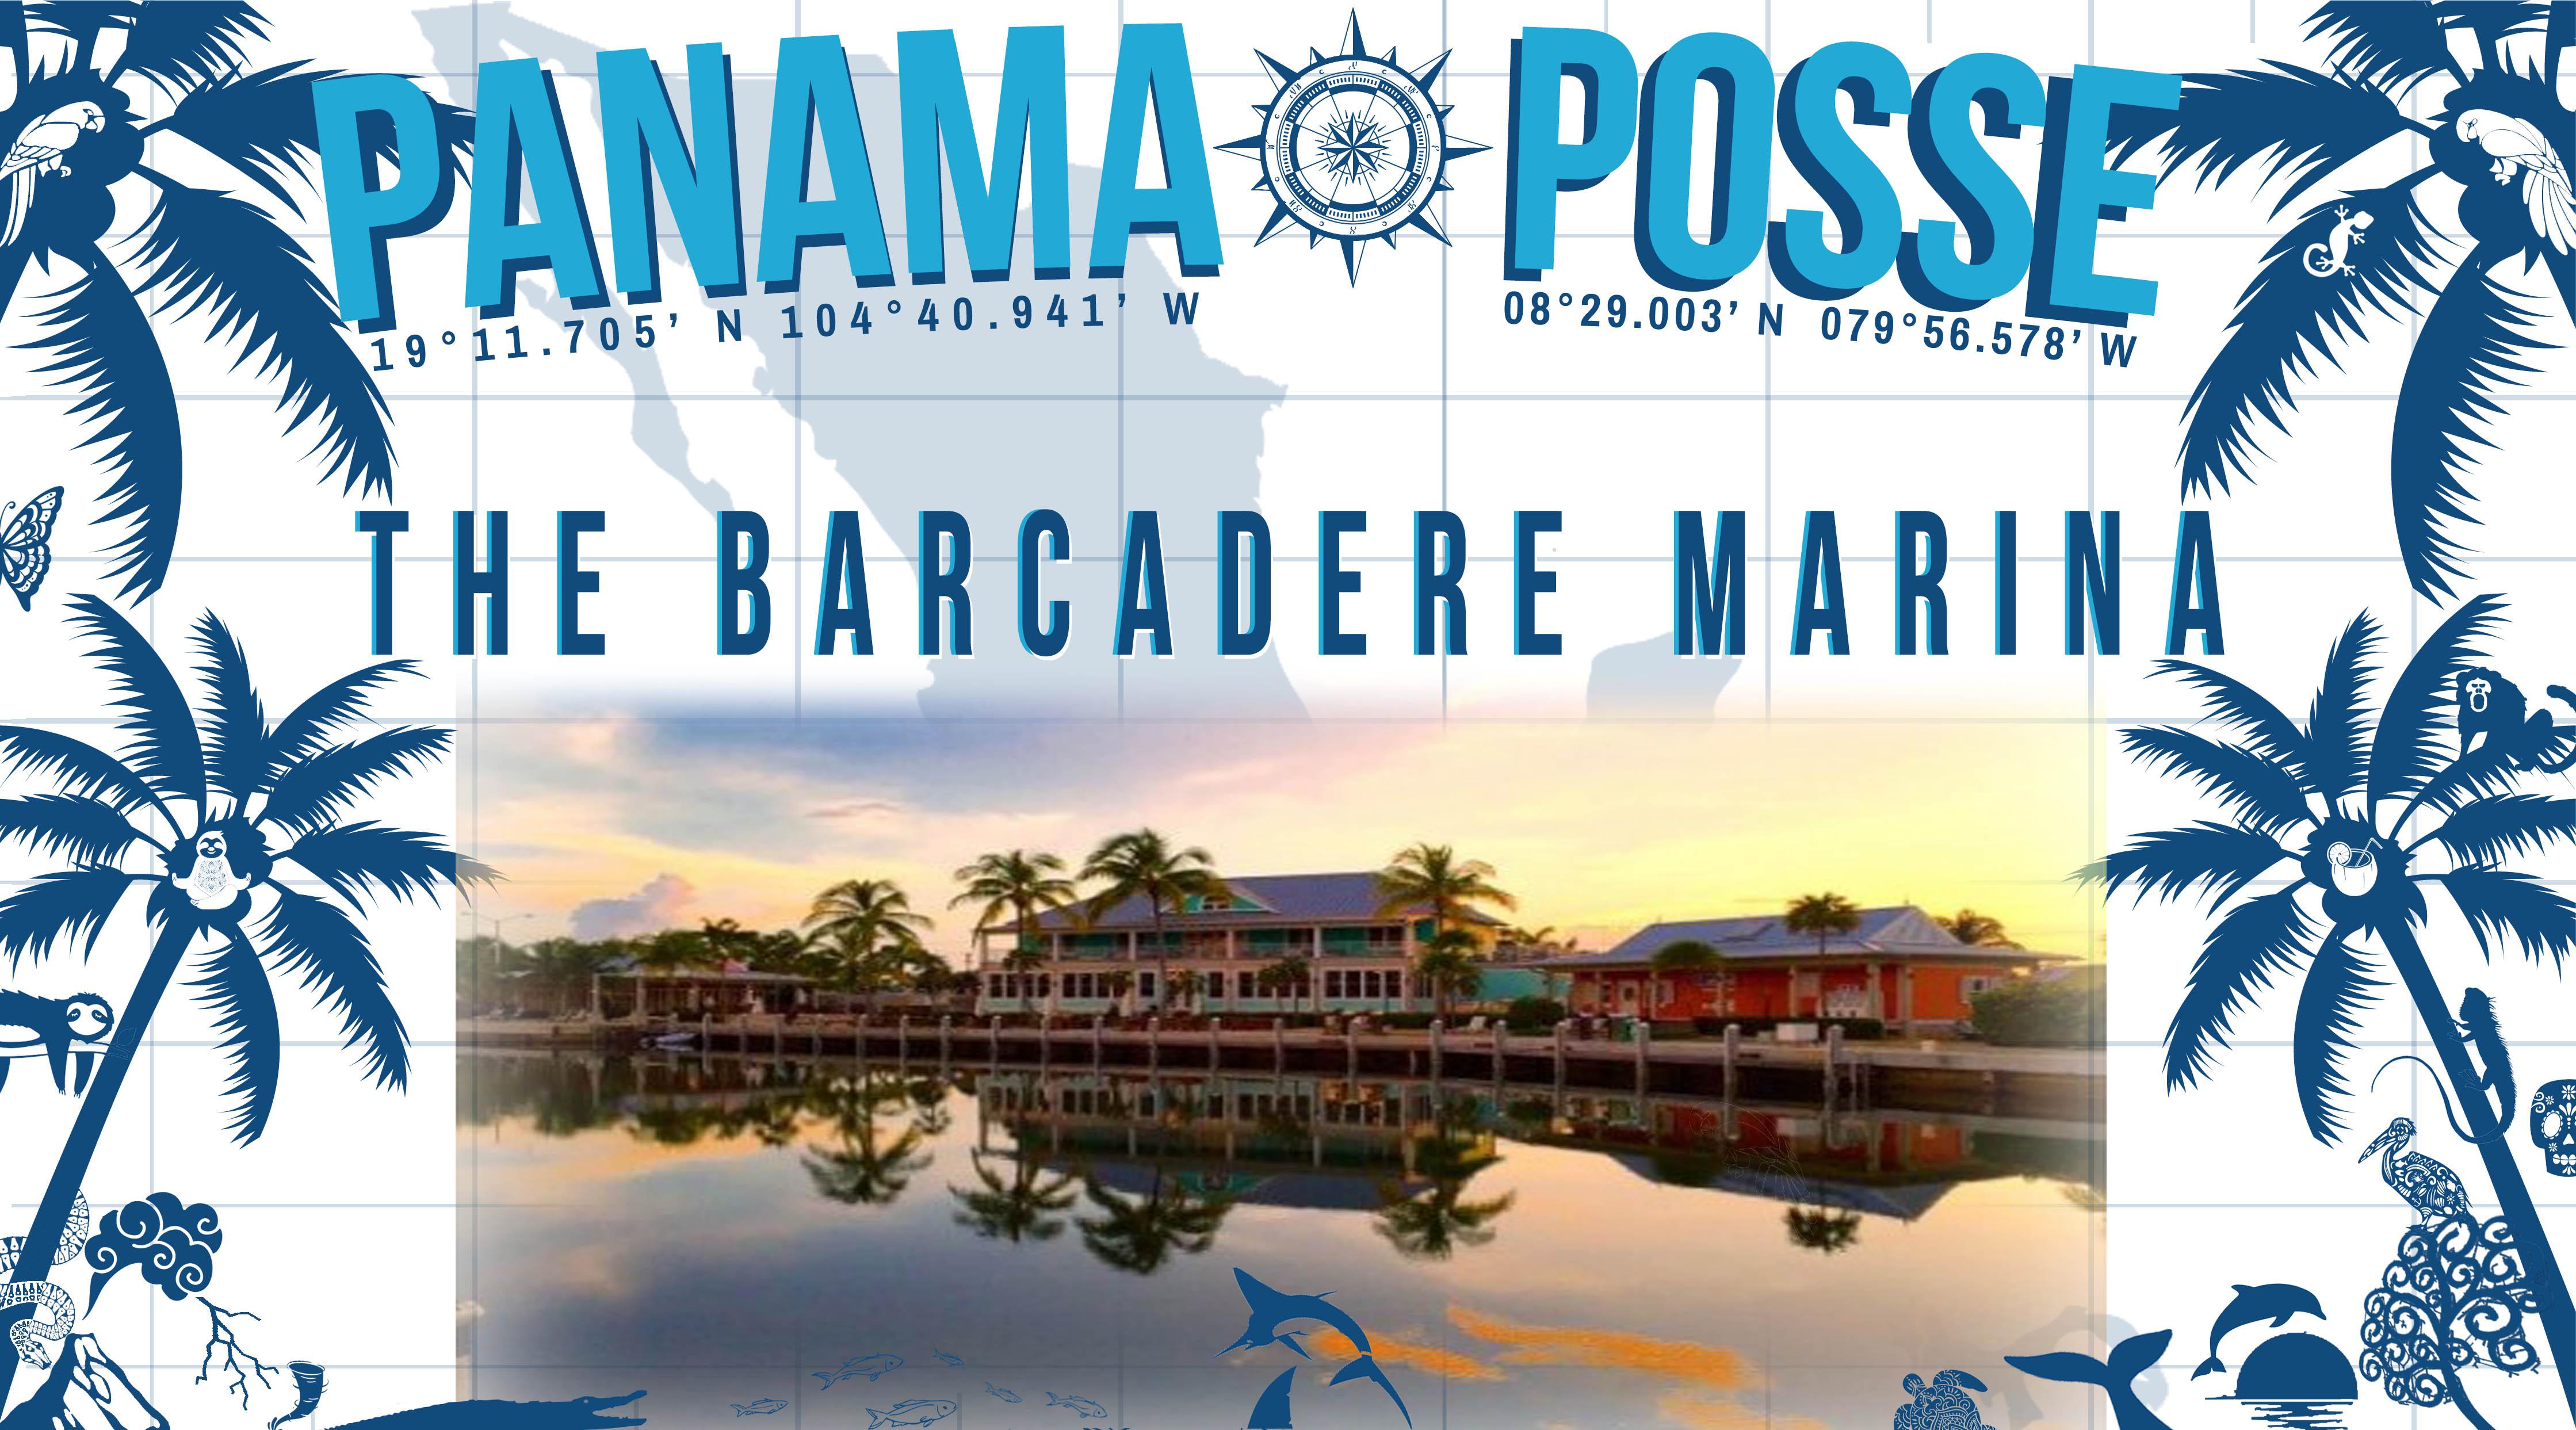 The Barcadere Marina